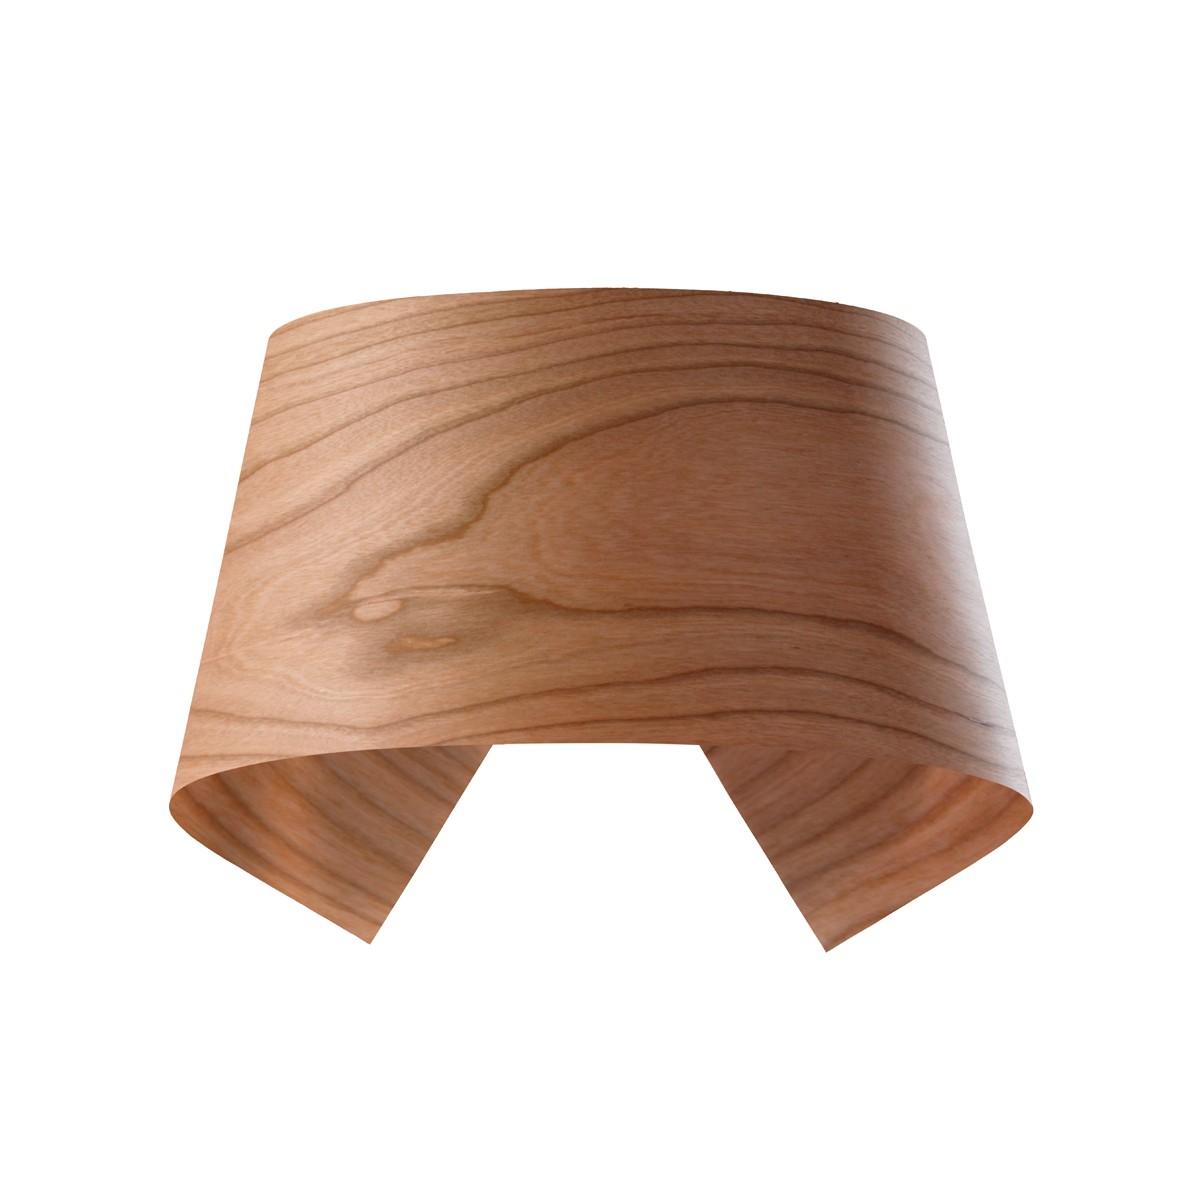 LZF Lamps Hi-Collar Wandleuchte, Kirsche